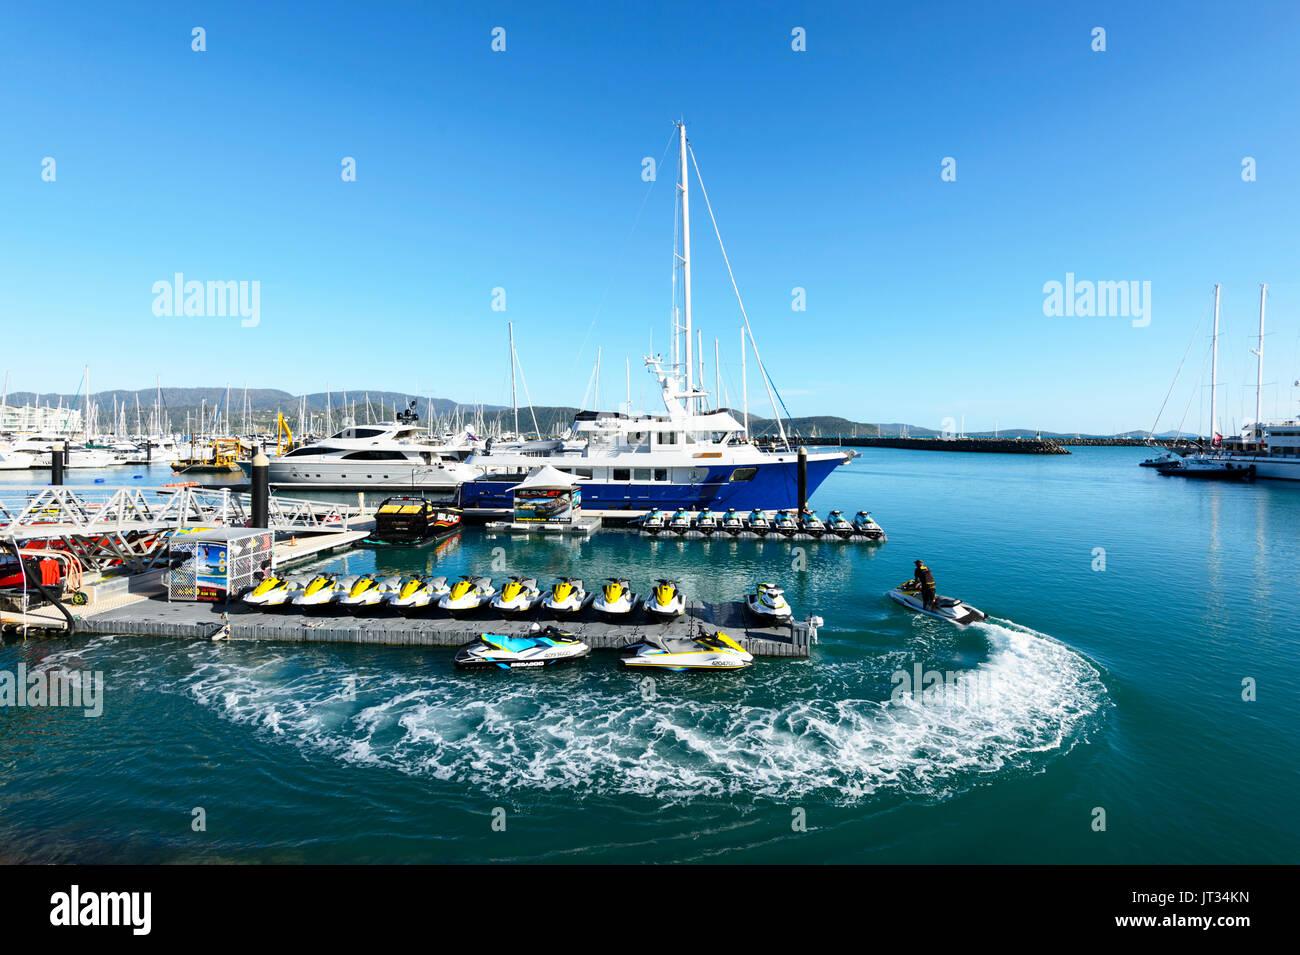 yachts-and-jetskis-at-abell-point-marina